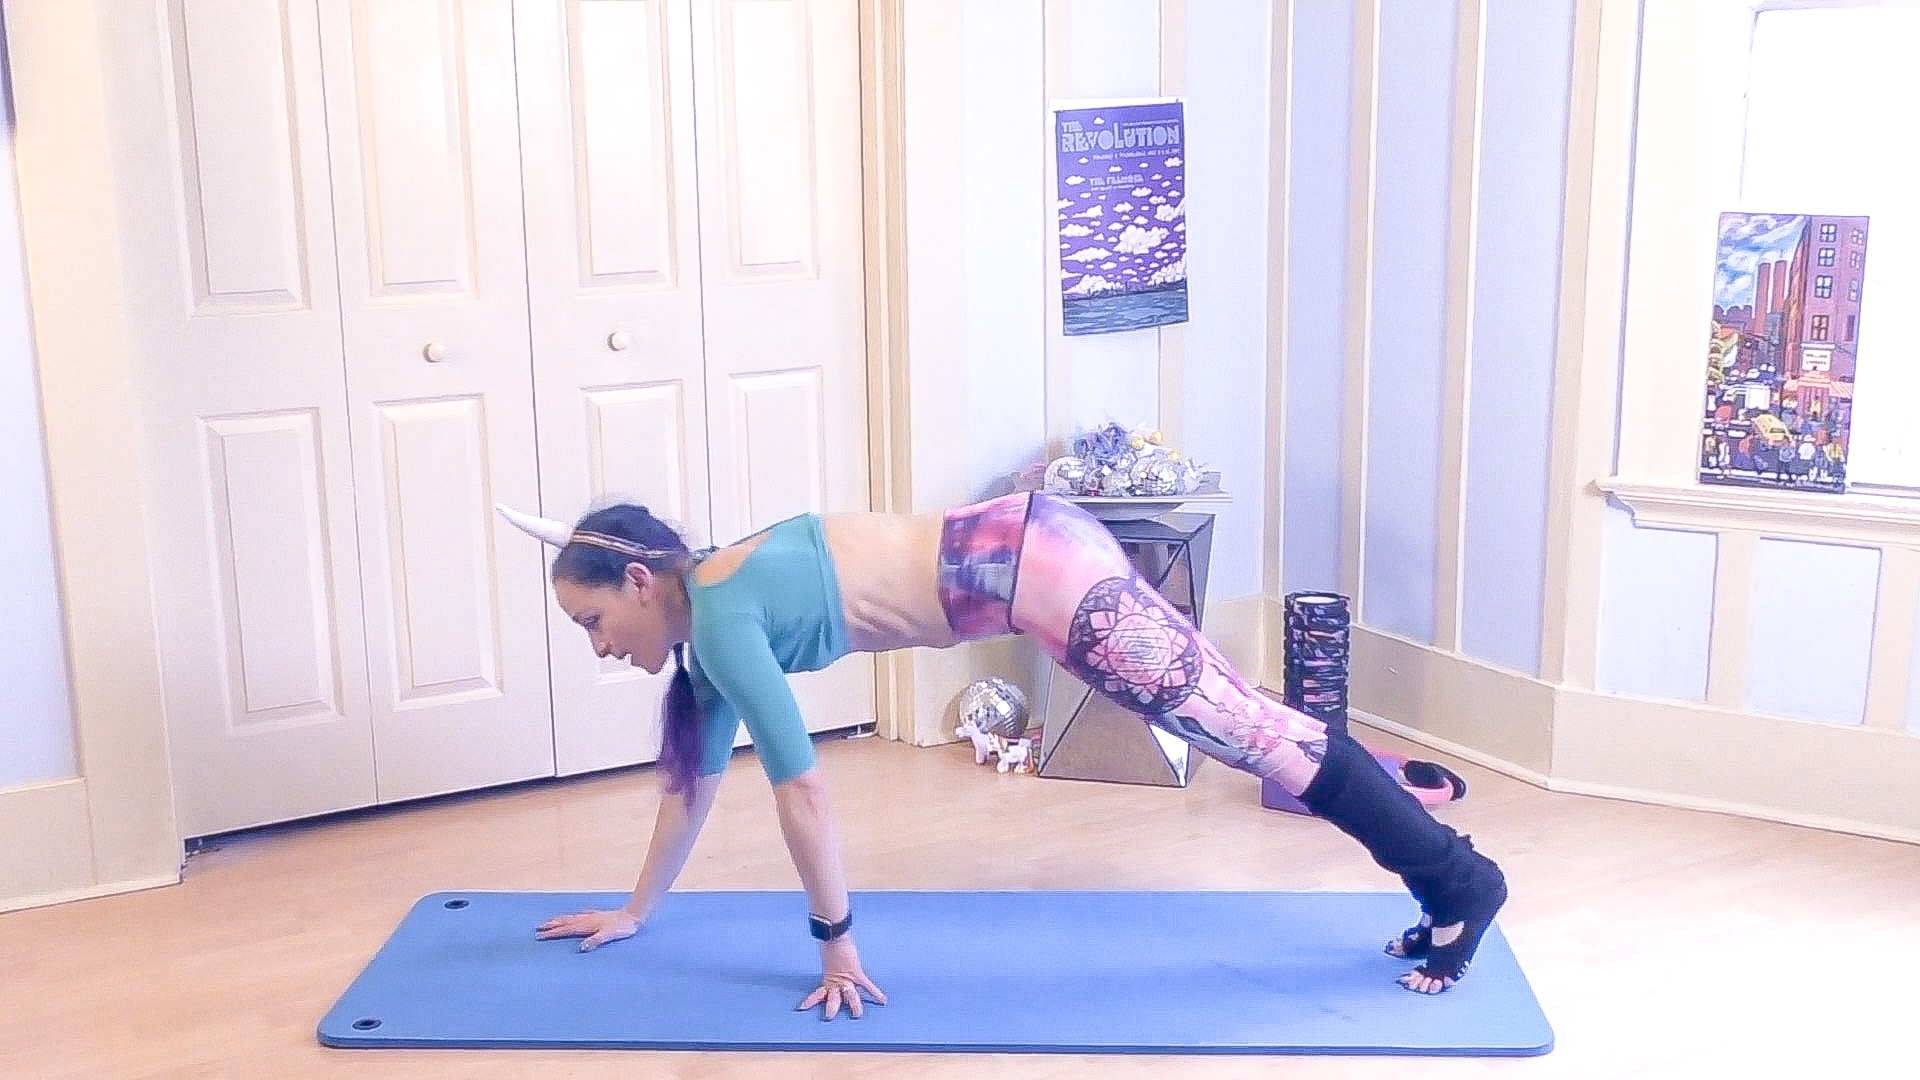 pilates push up march matness unicor jessi fit pilates